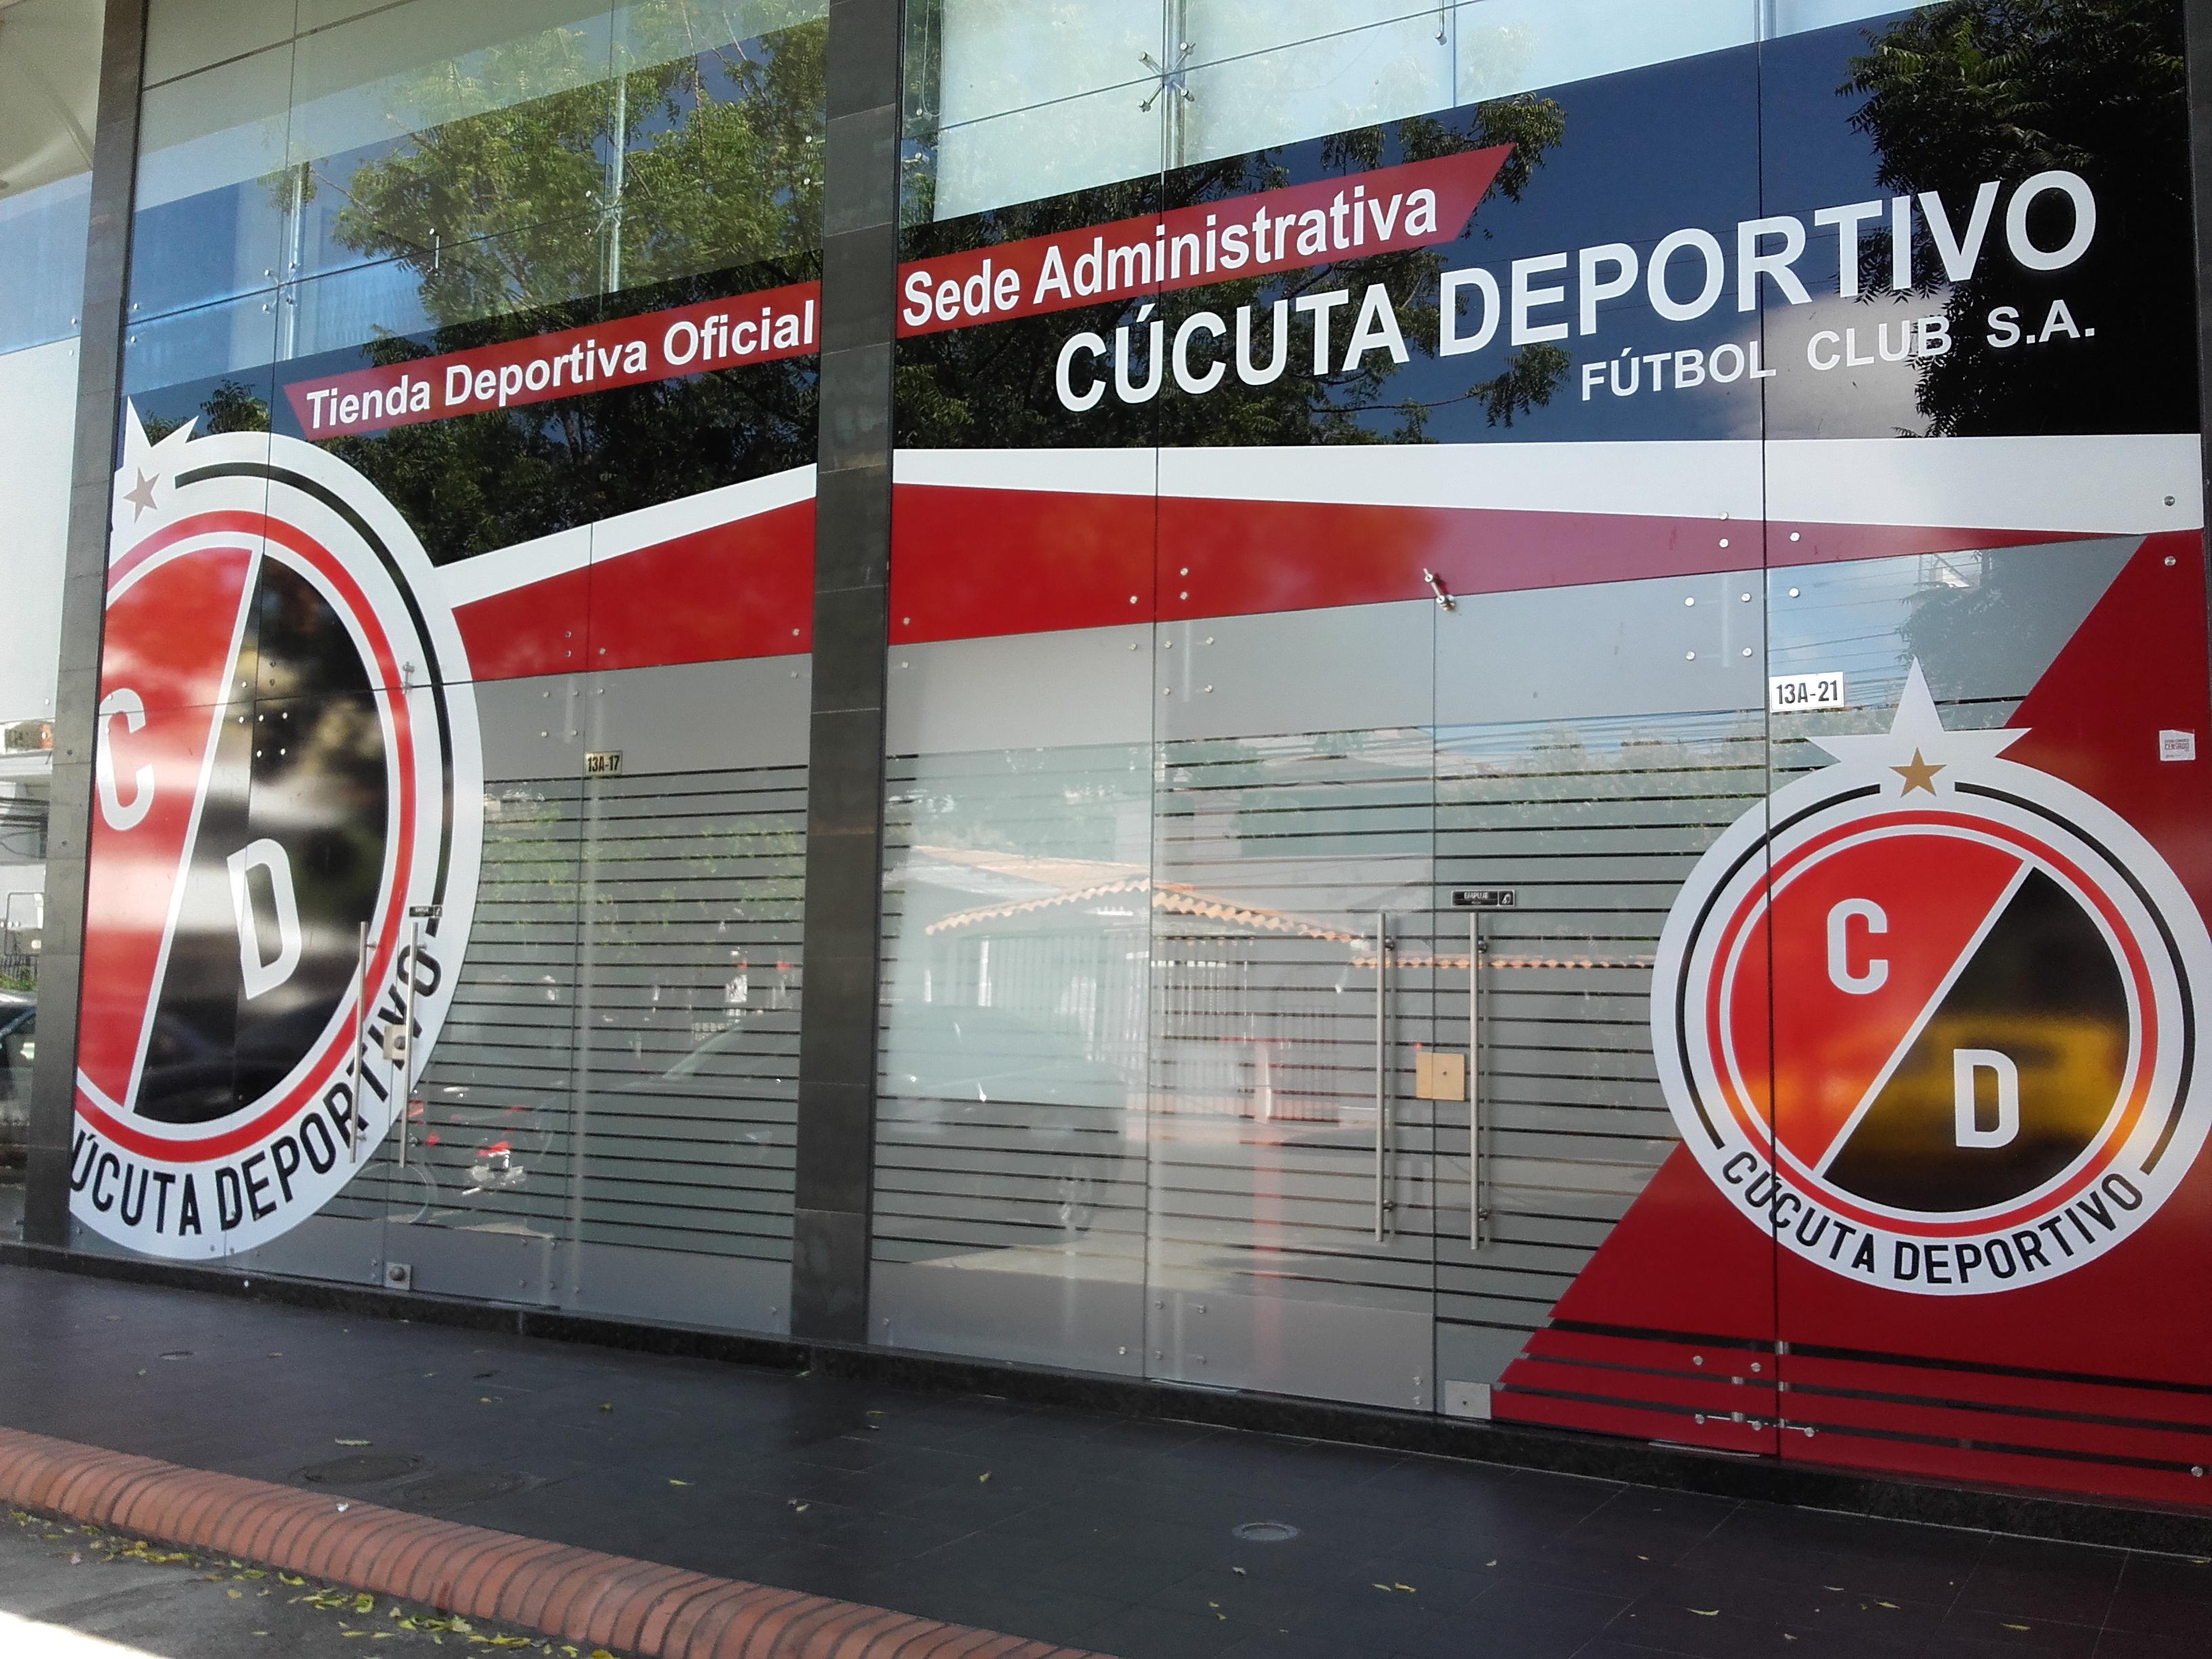 Cucuta Deportivo Wikipedia Wolna Encyklopedia